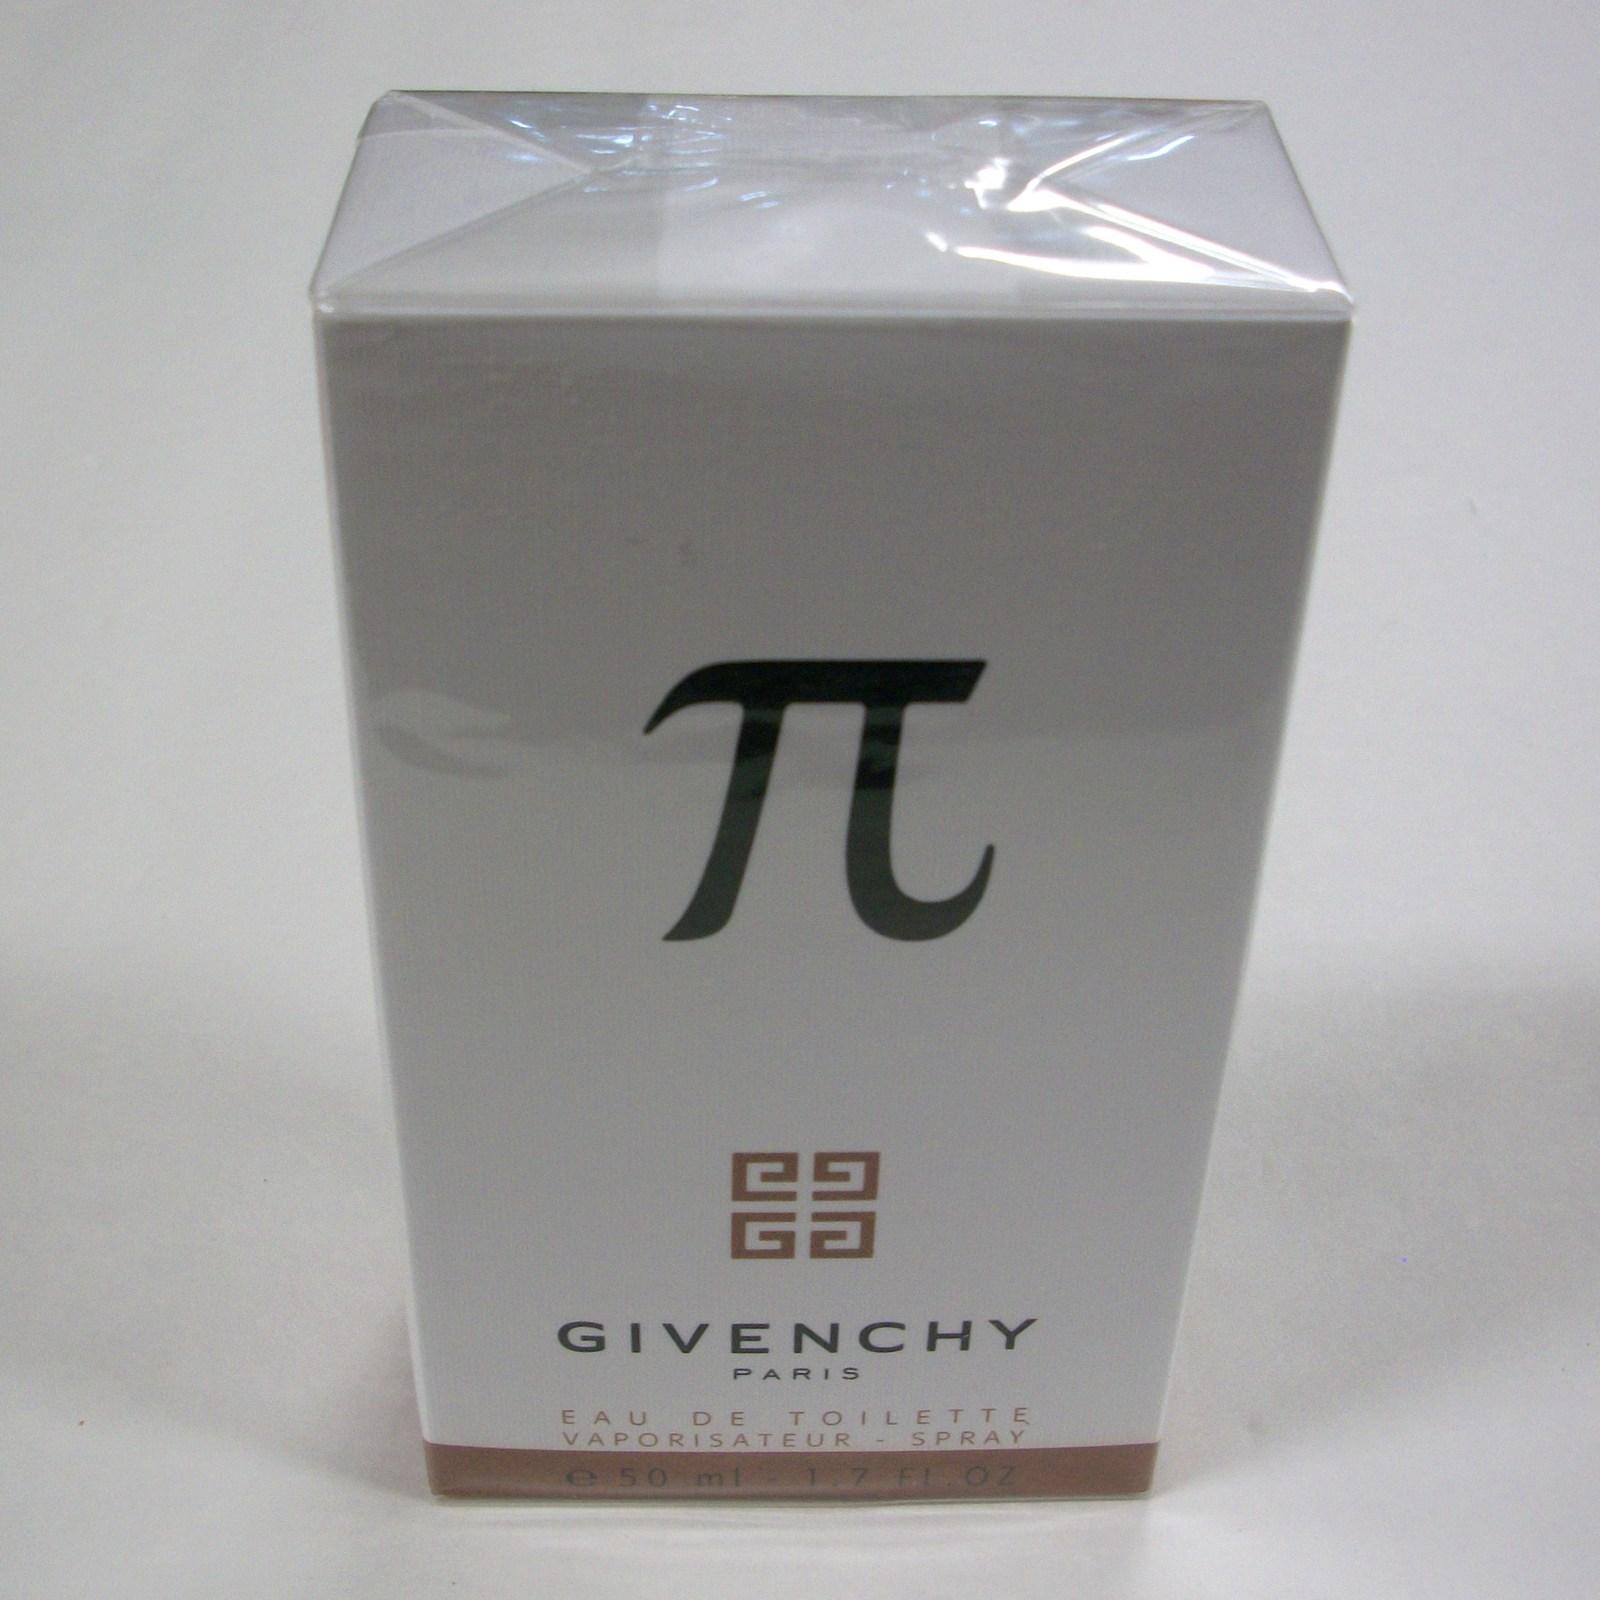 Givenchy PI by Givenchy for Men 1.7 fl.oz / 50 eau de toilette spray image 3